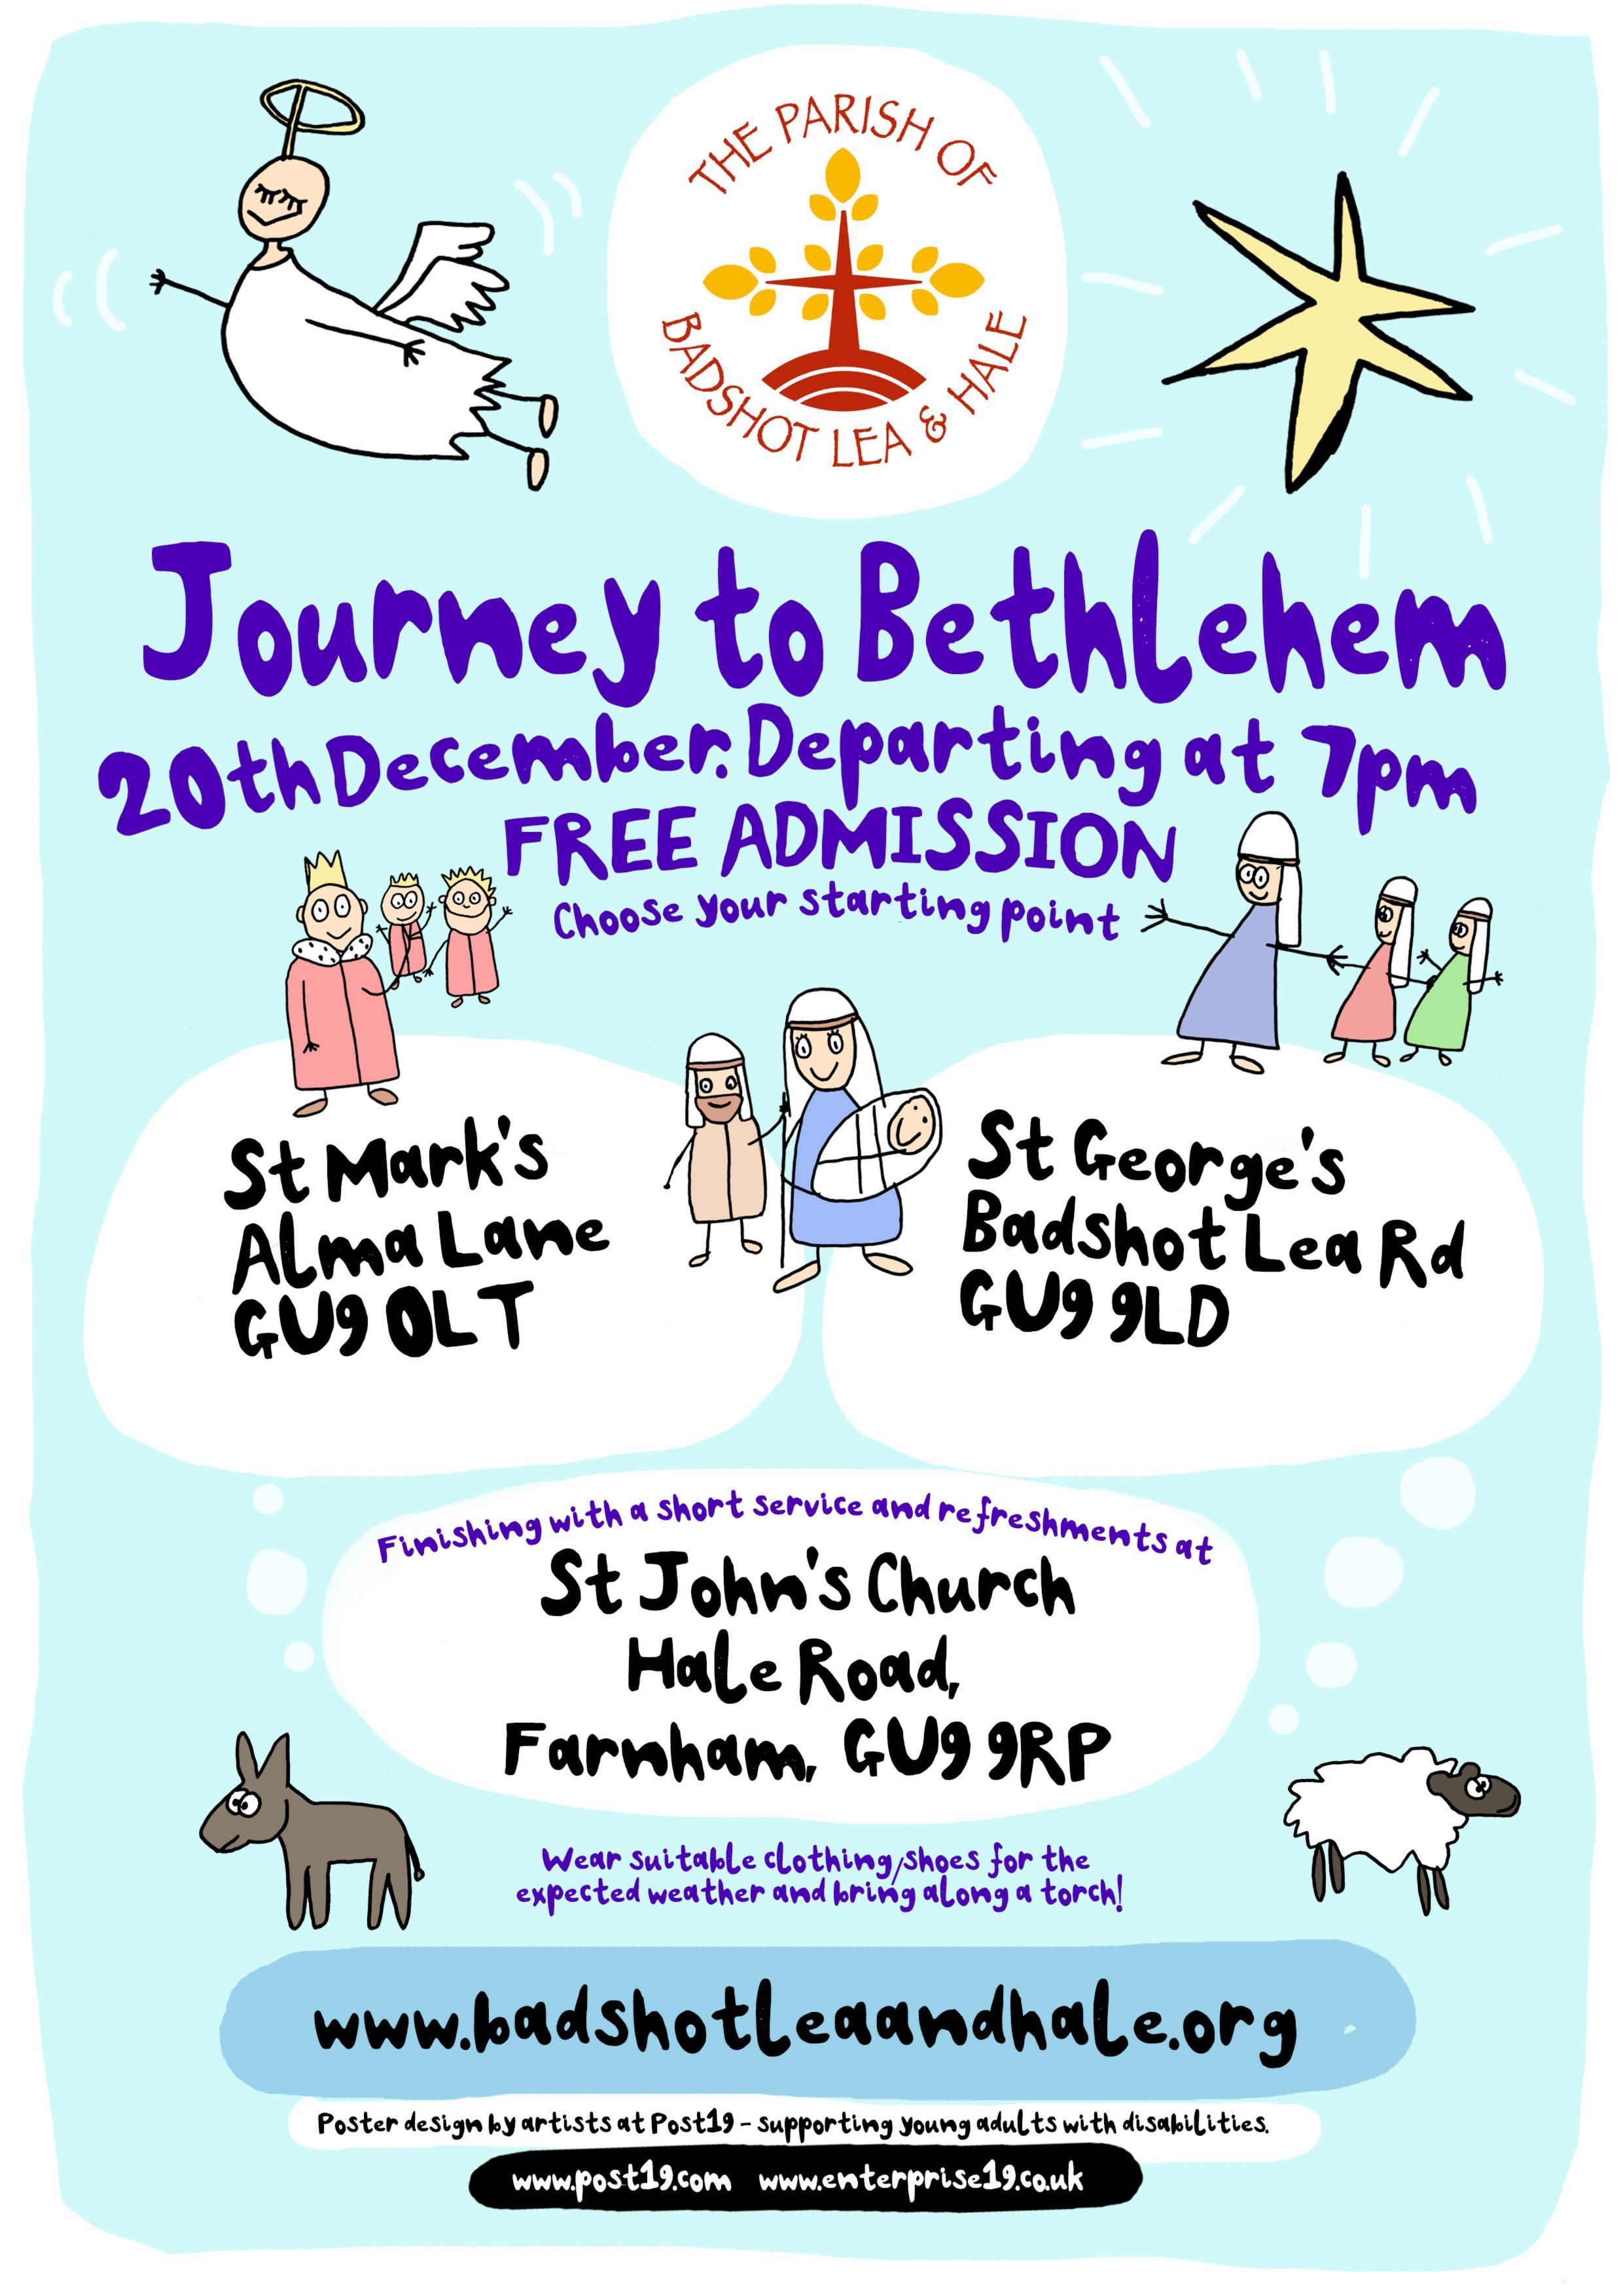 Journey to Bethlehem front